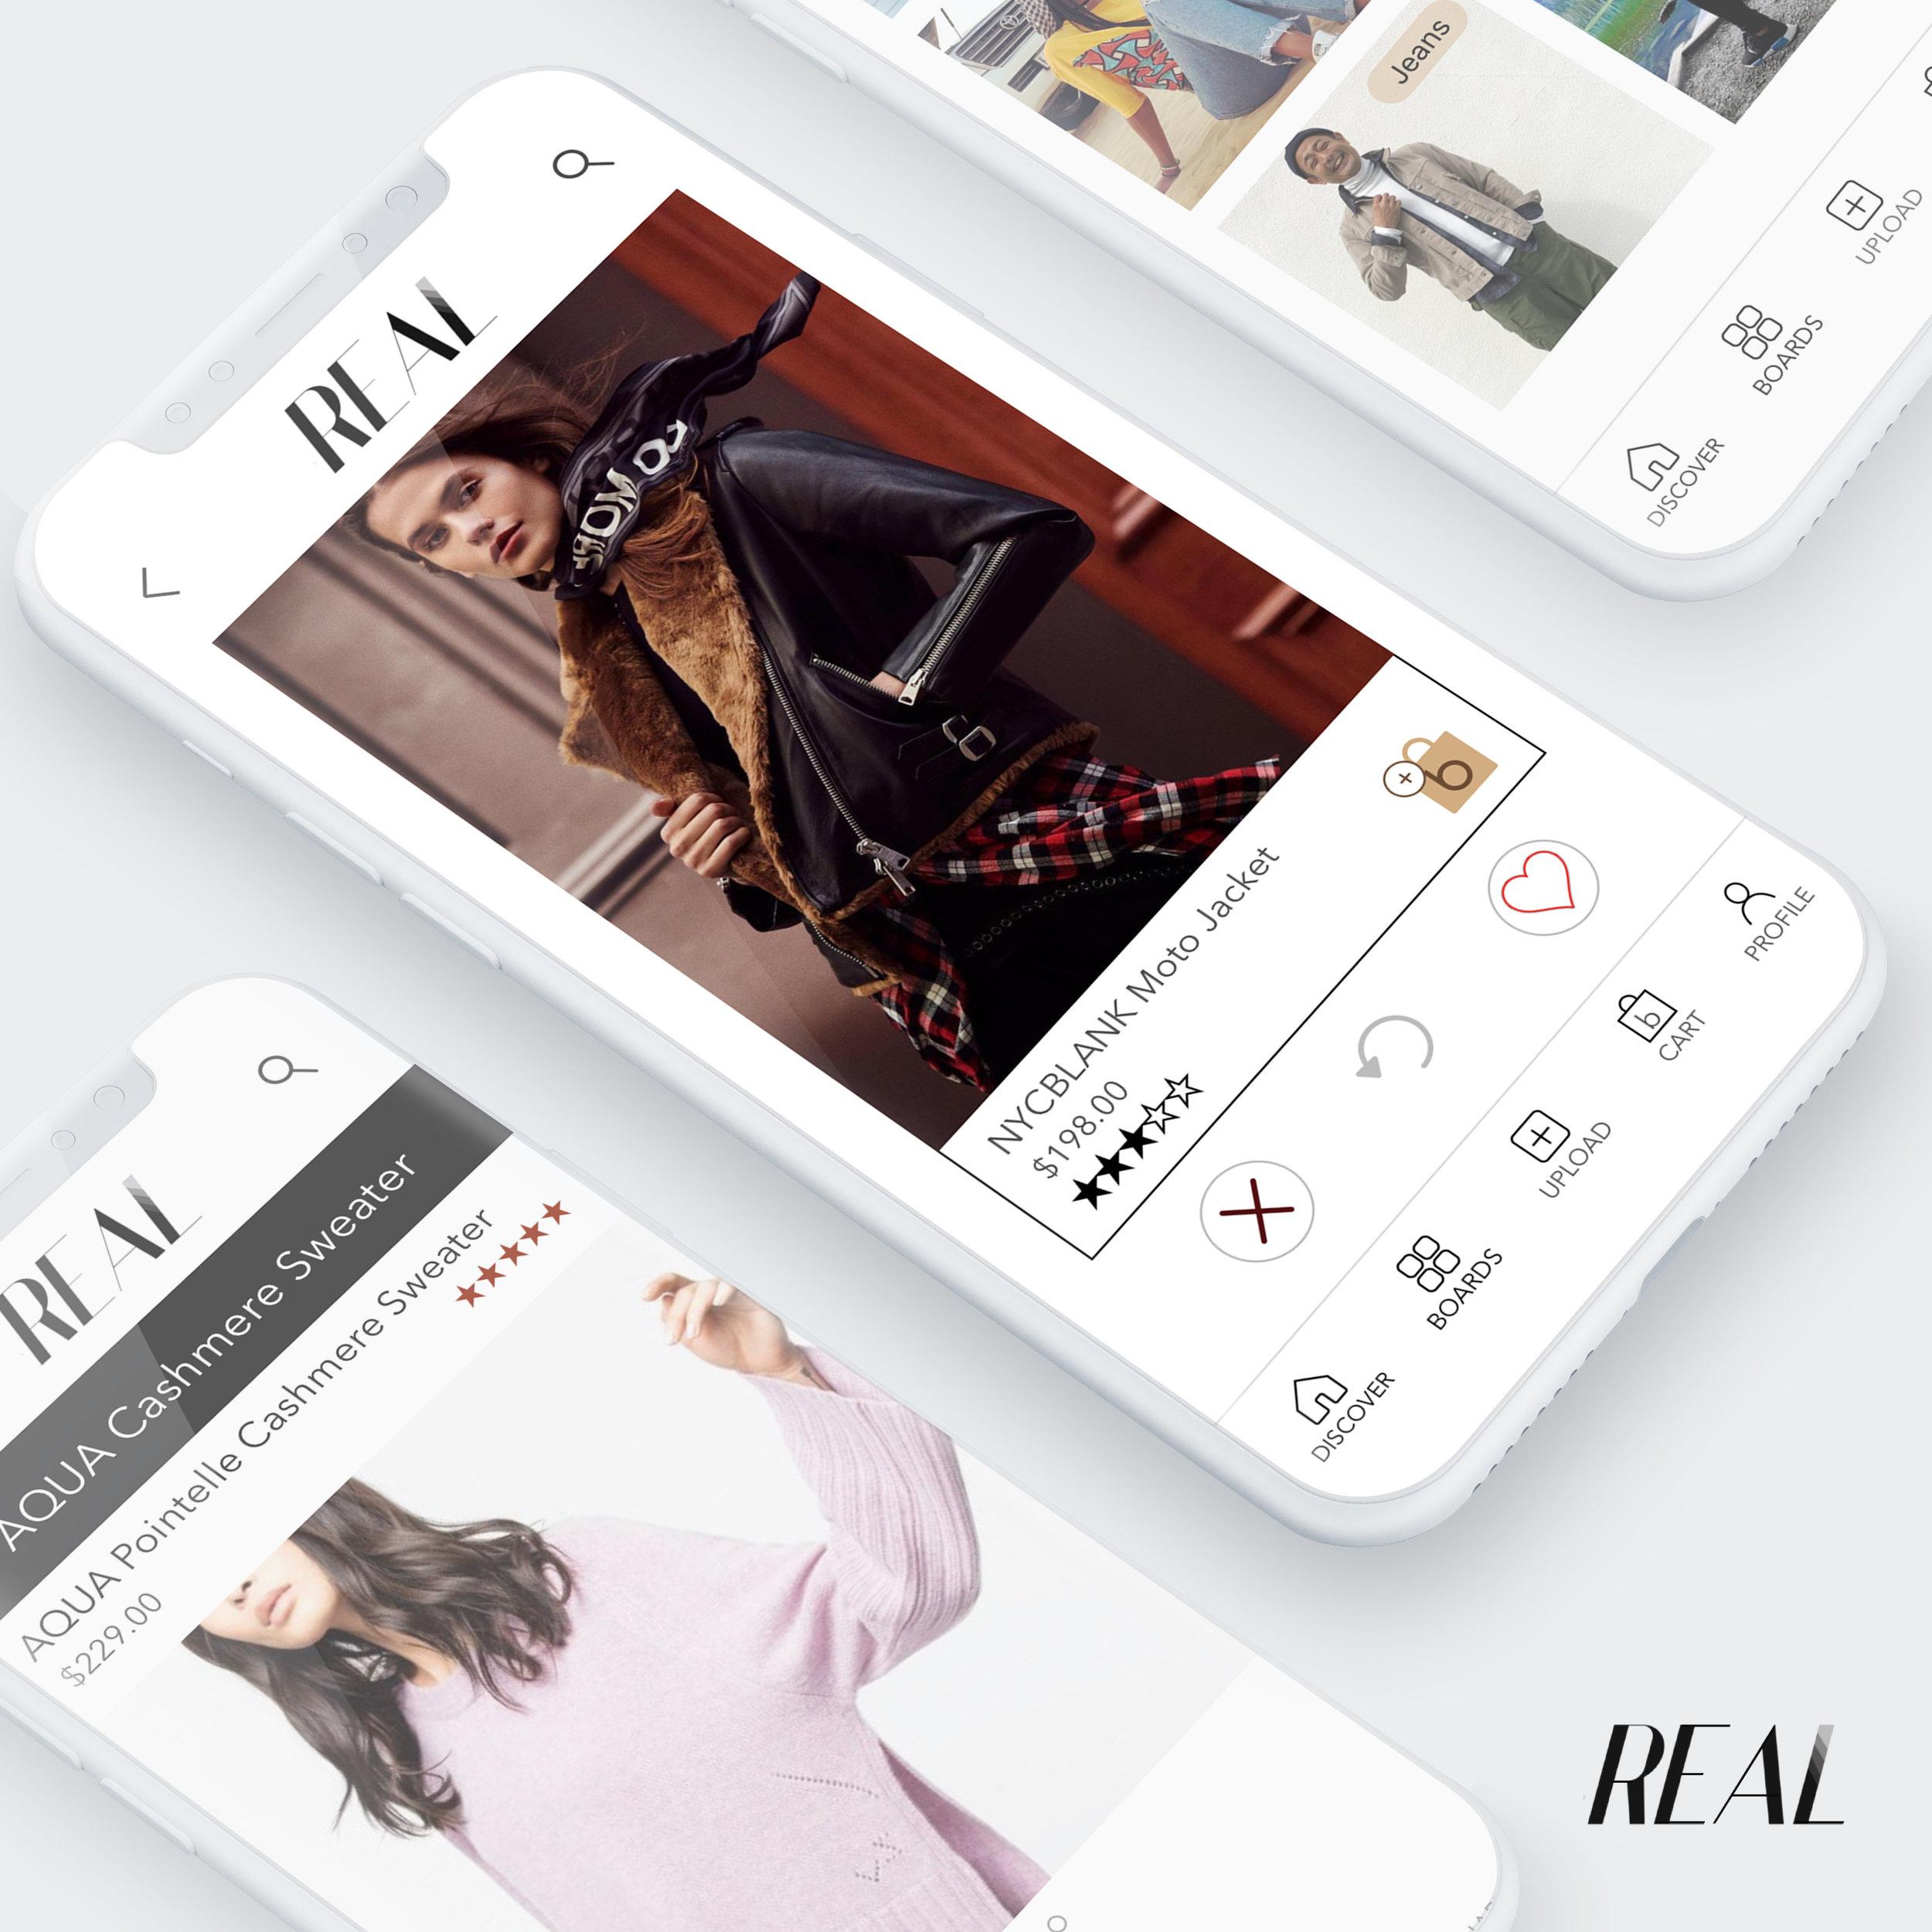 REAL_iphone_angle.jpg